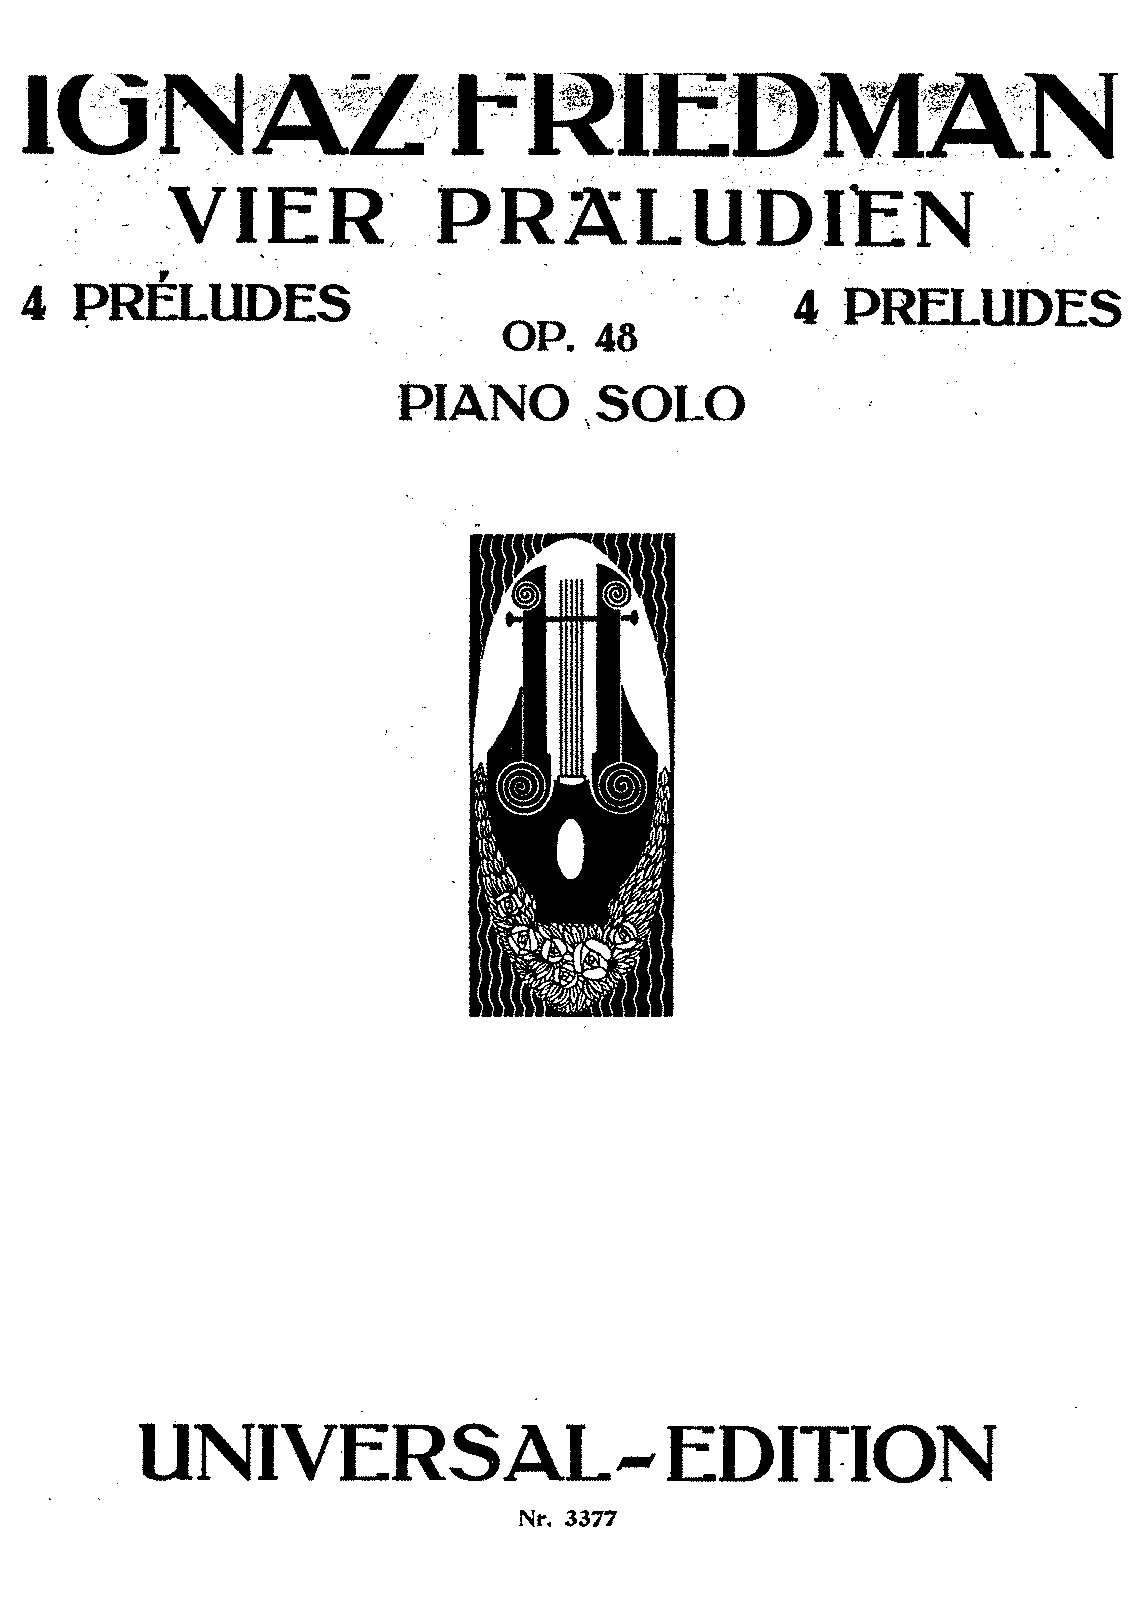 4 Preludes, Op 48 (Friedman, Ignaz) - IMSLP/Petrucci Music Library